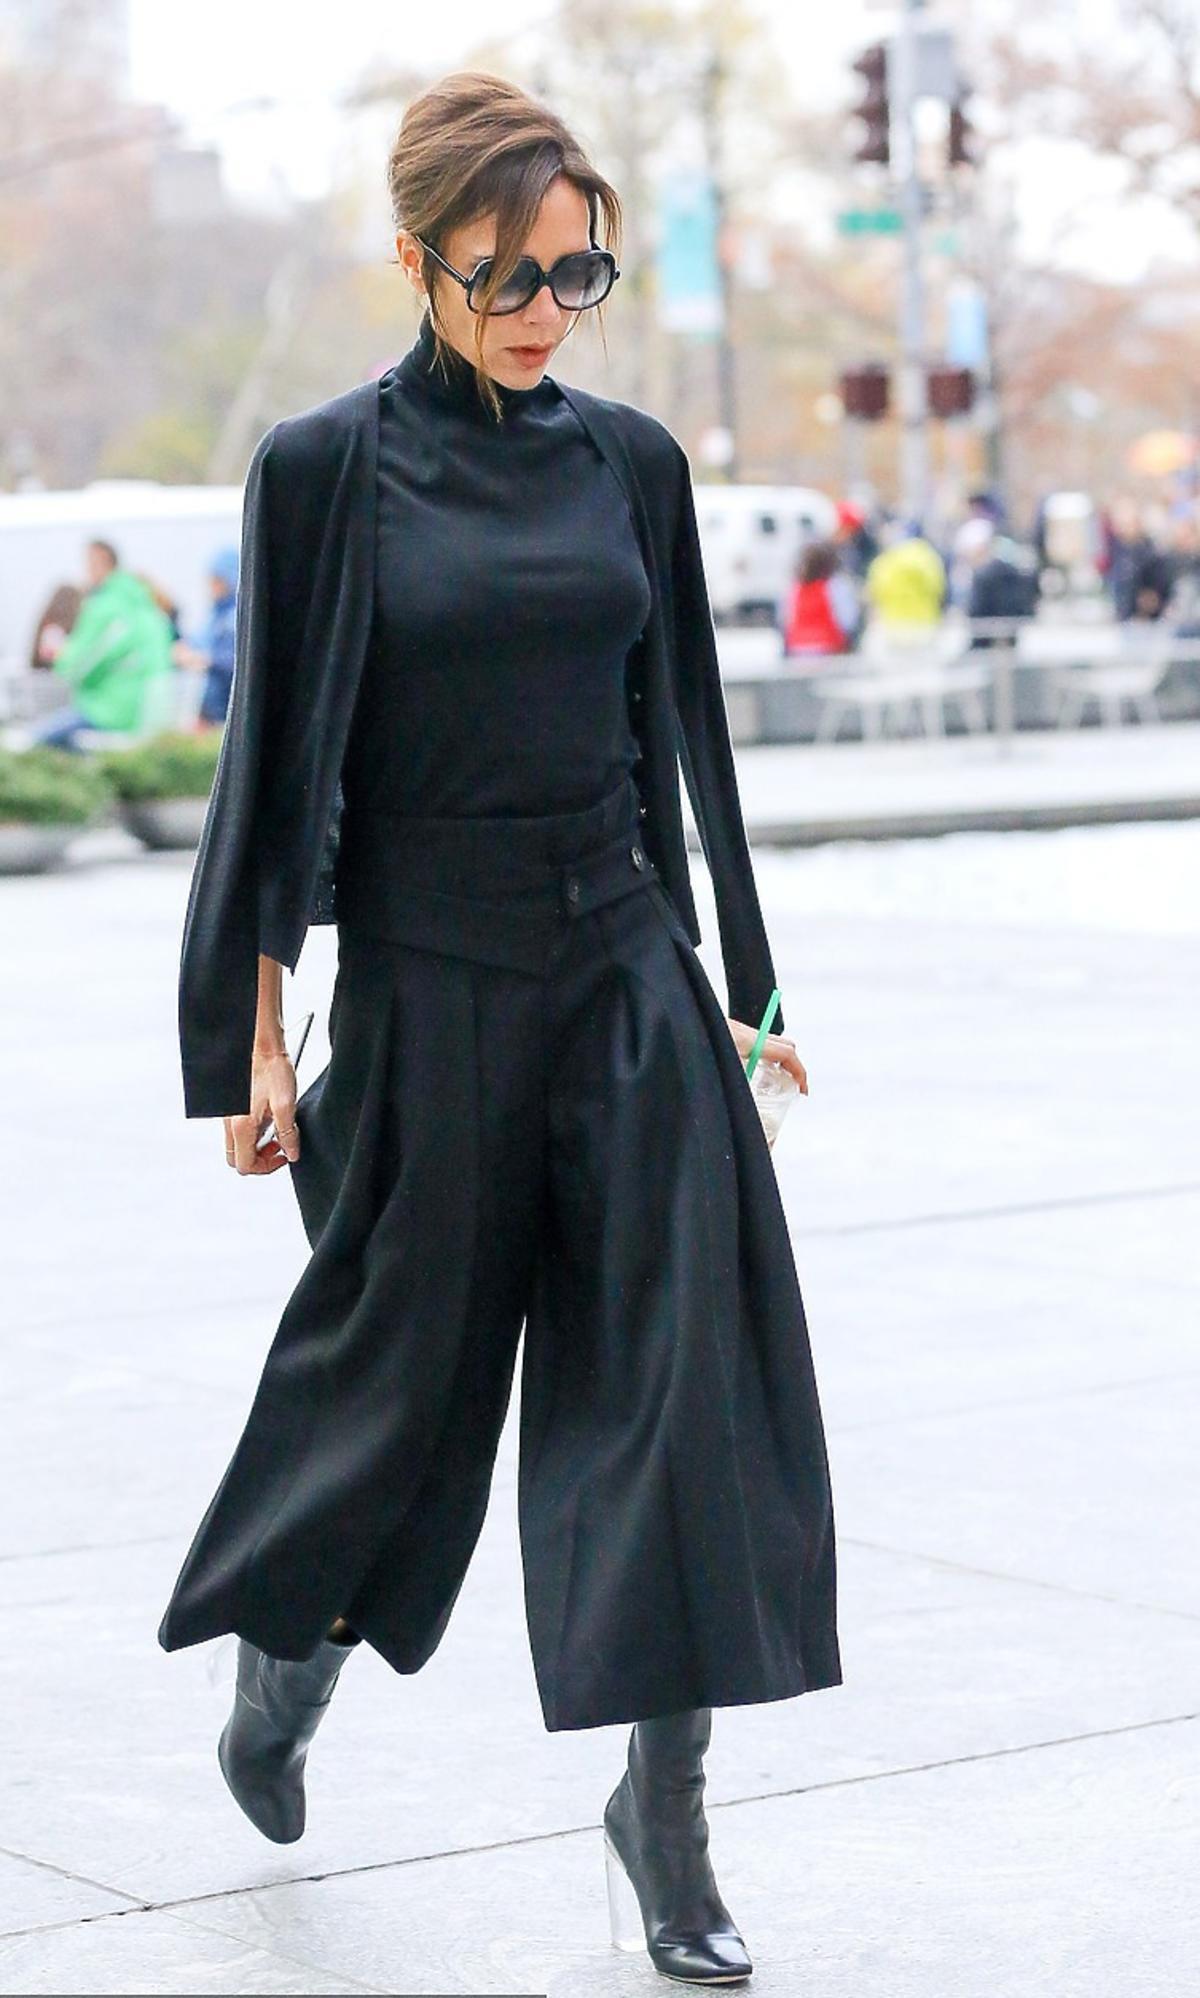 Victoria Beckham w czarnych spoddniach, bluzce, butach i okularach